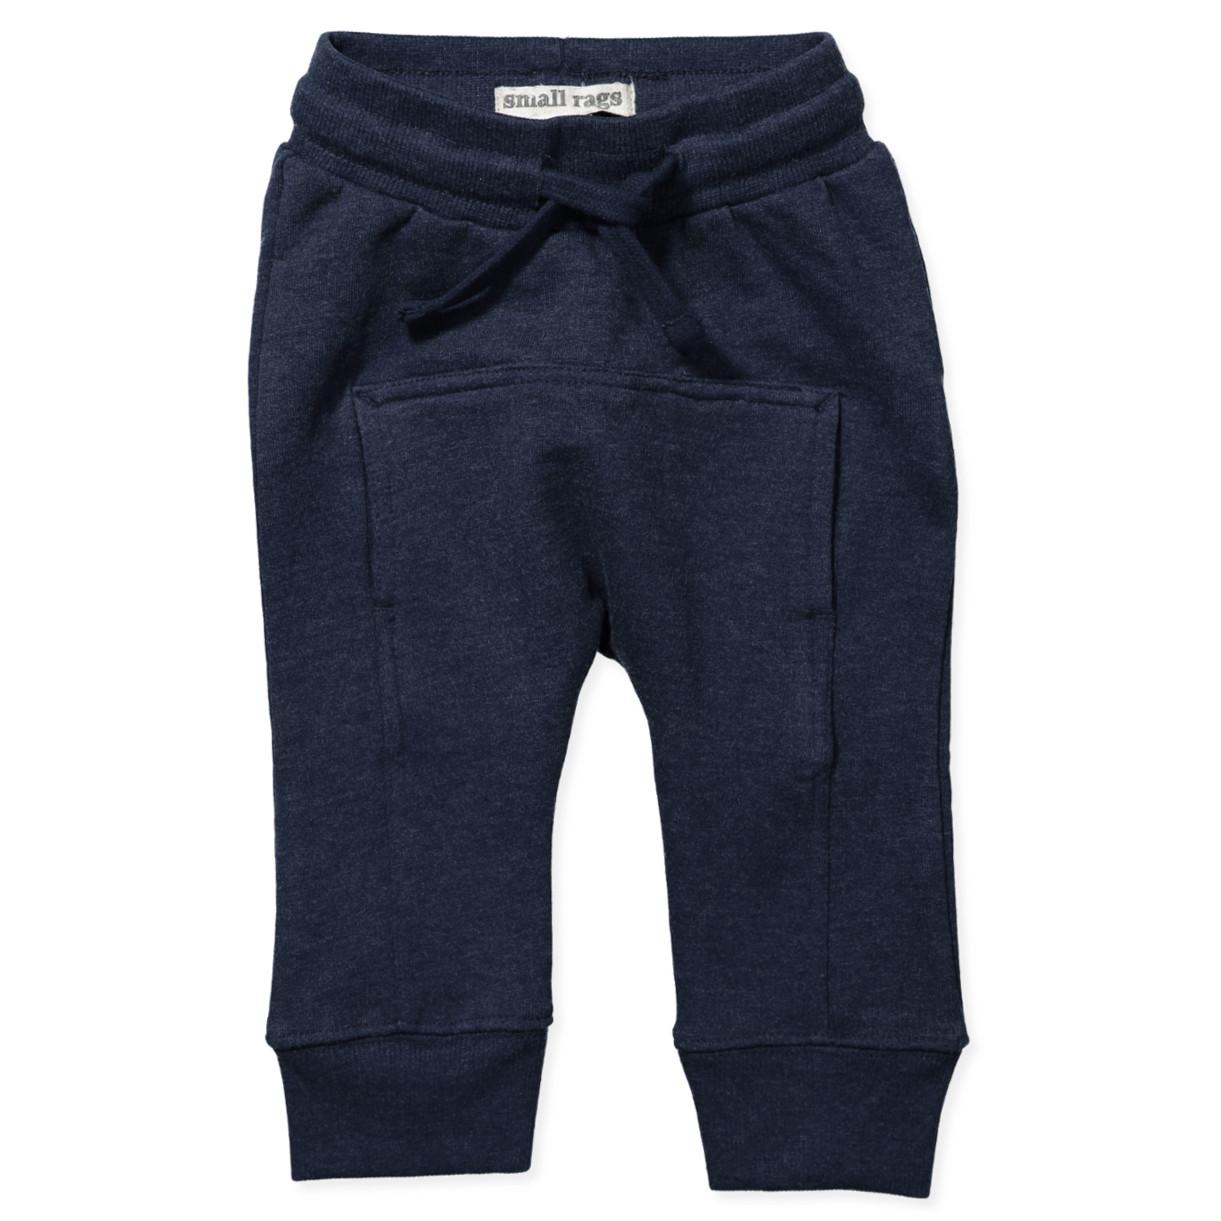 Navy bukser